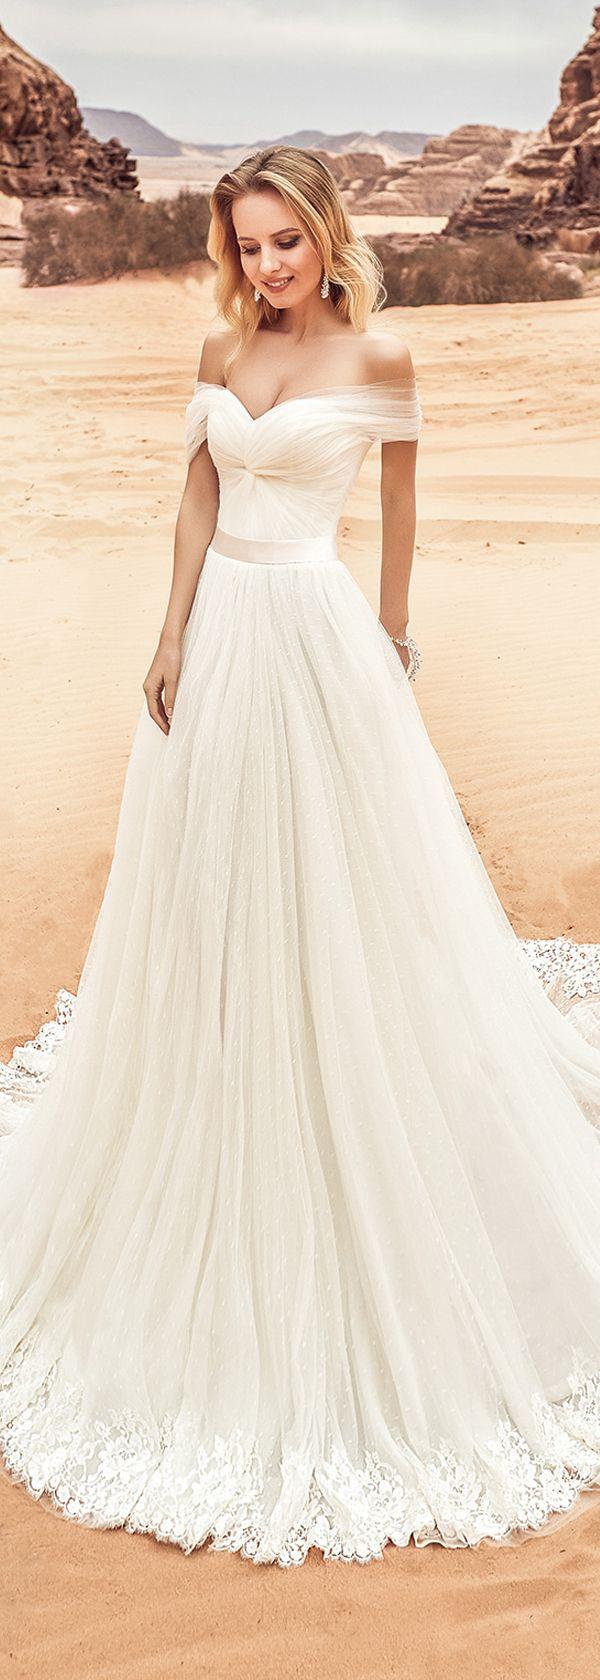 Fantastic Tulle Off-the-shoulder Neckline A-line Wedding Dress With Lace  Appliques 88d761300590